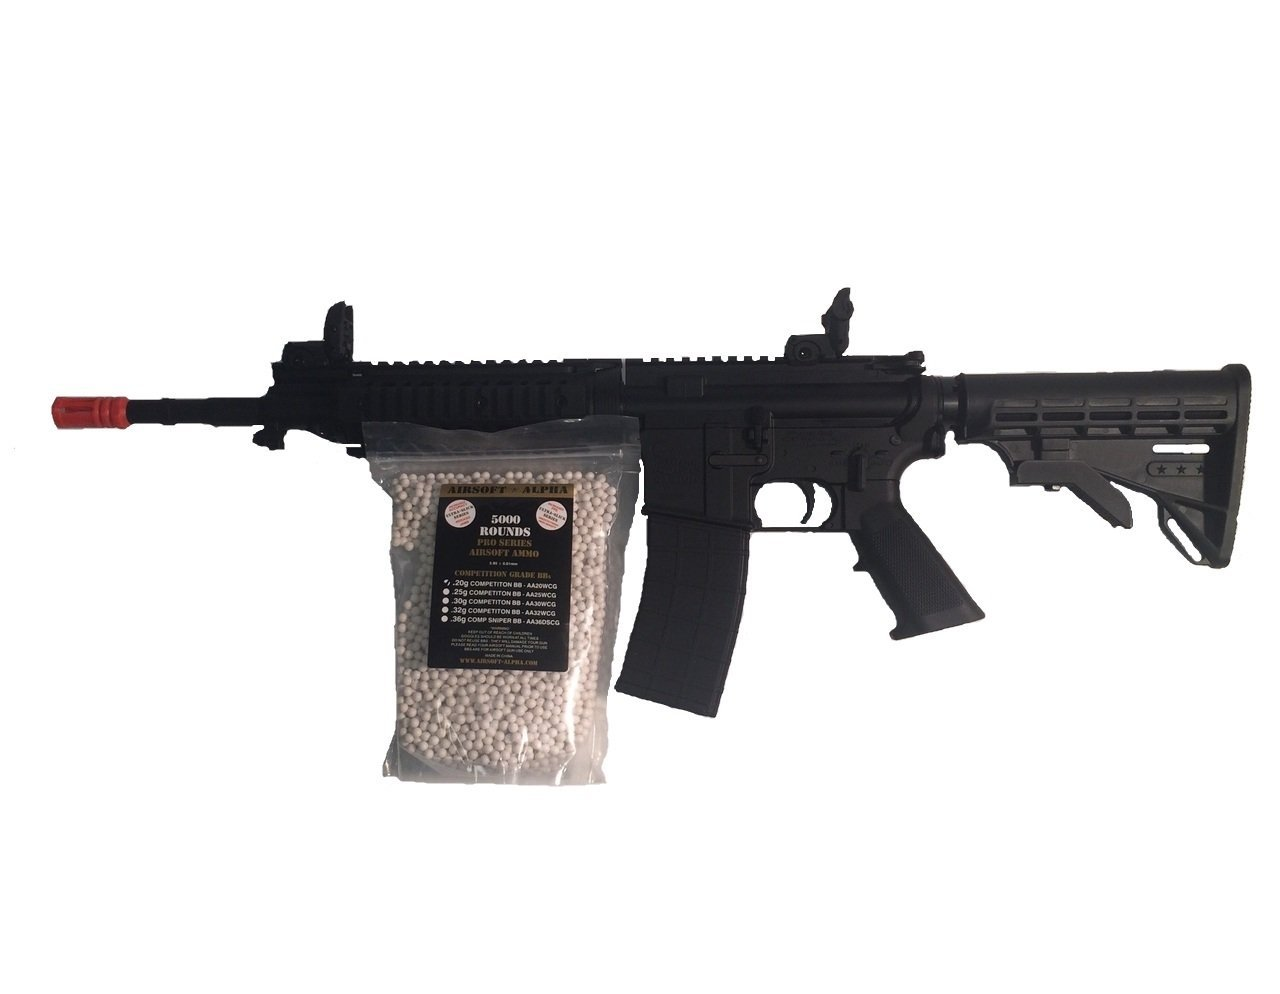 Cheap Jackal Blank Gun, find Jackal Blank Gun deals on line